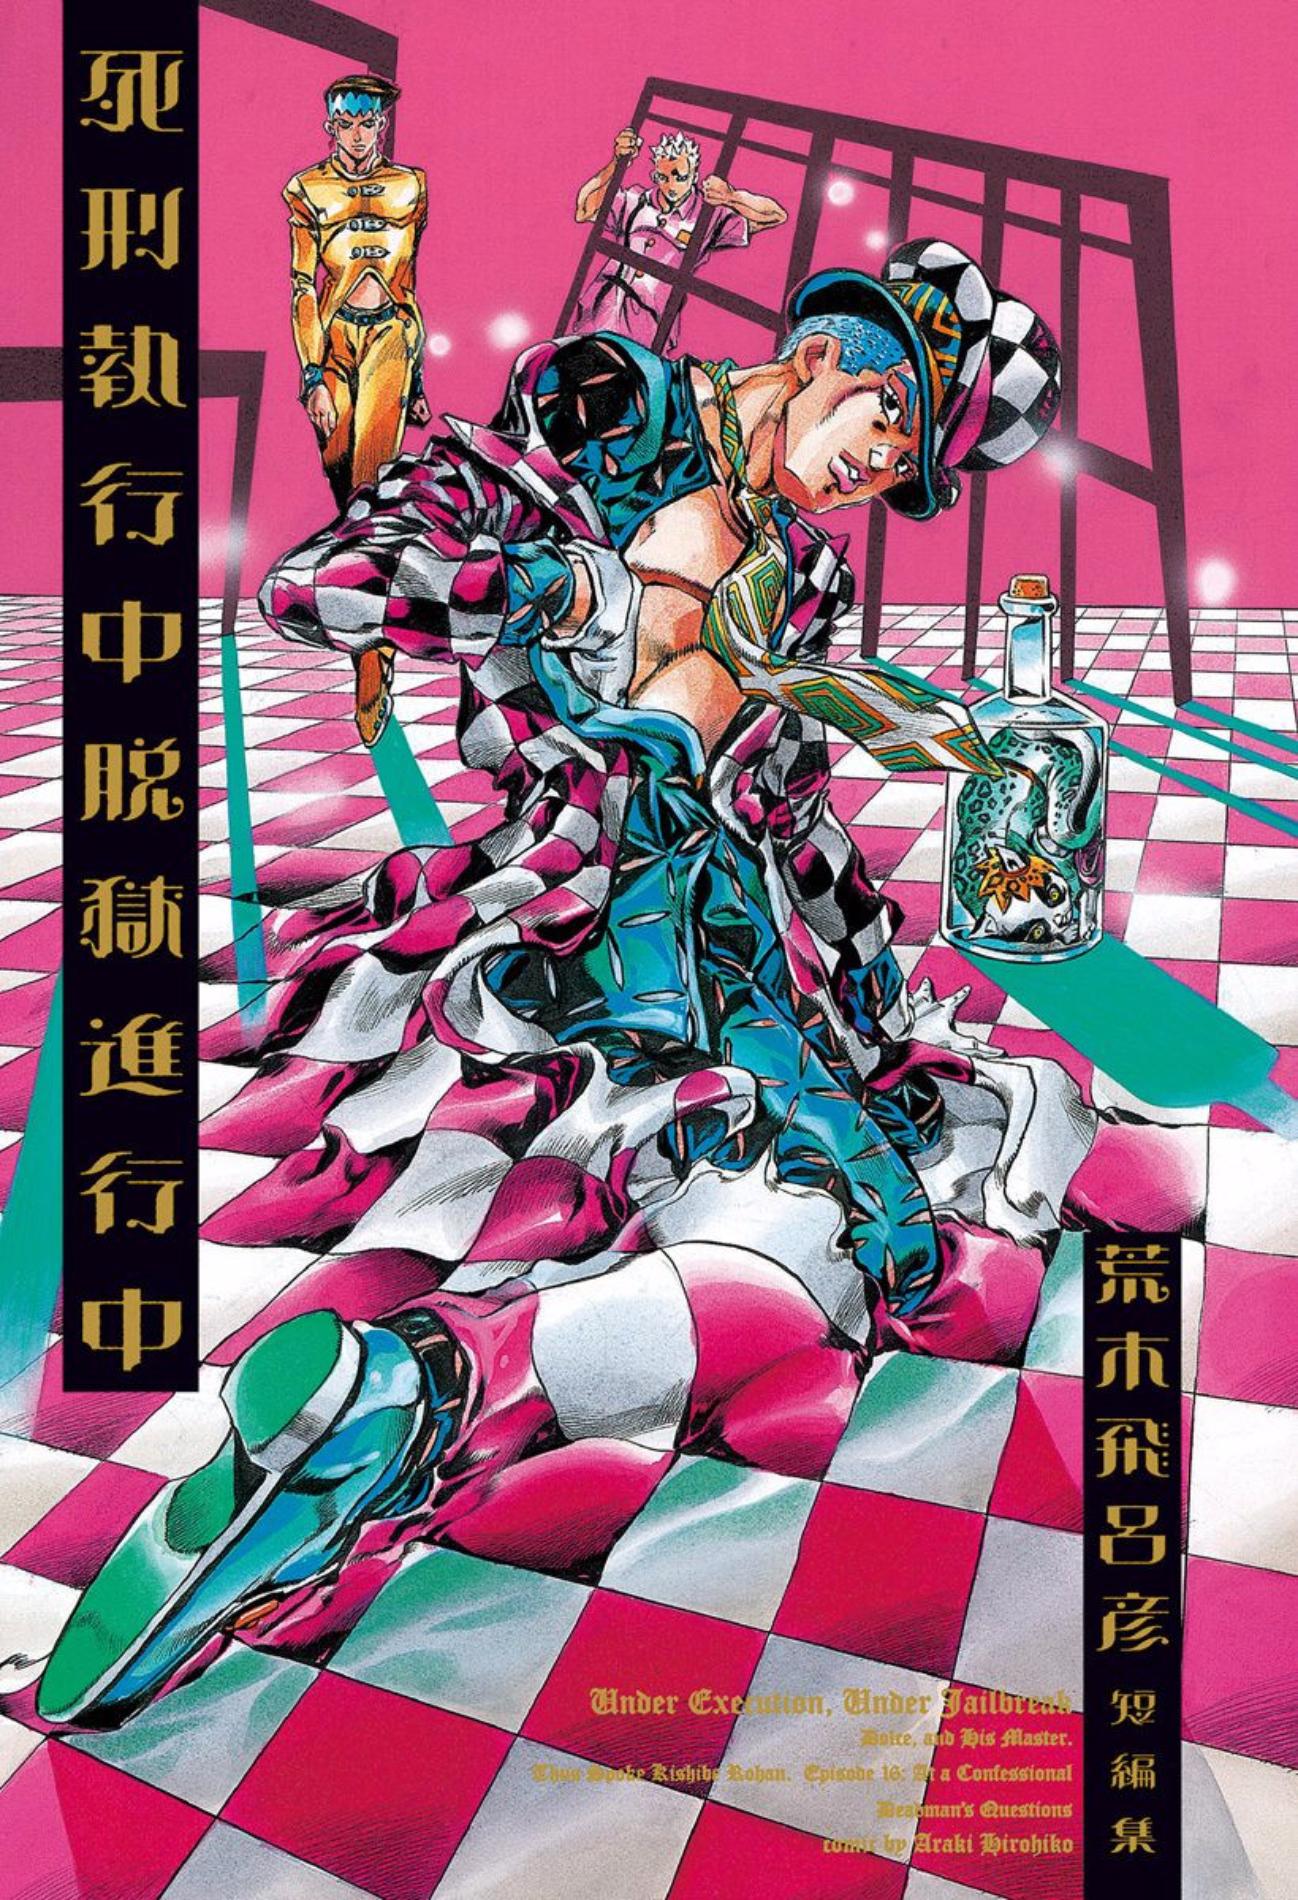 Manga - preporuke, analize, diskusije... - Page 4 Ujue